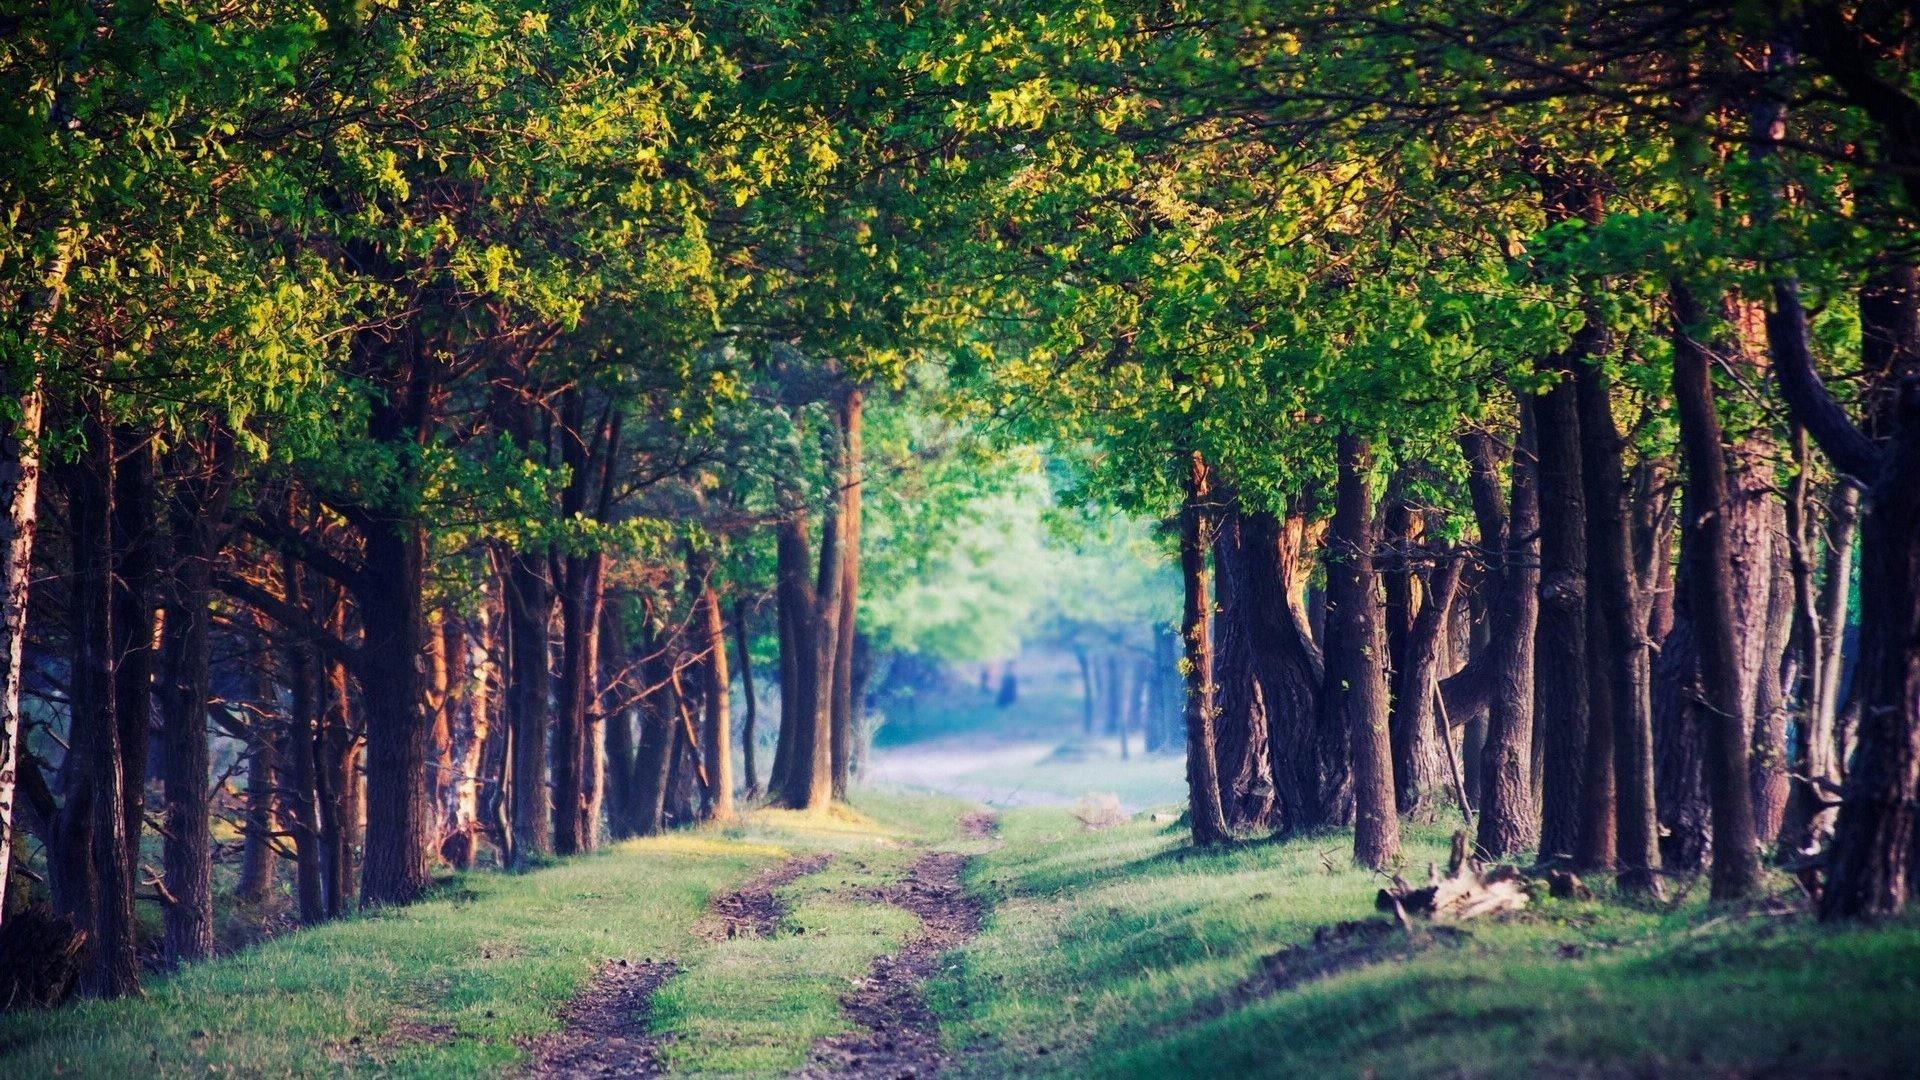 January 19, 2017 – Nature Beautiful Path Trees Scenery Fullscreen Wallpaper  for HD 16: